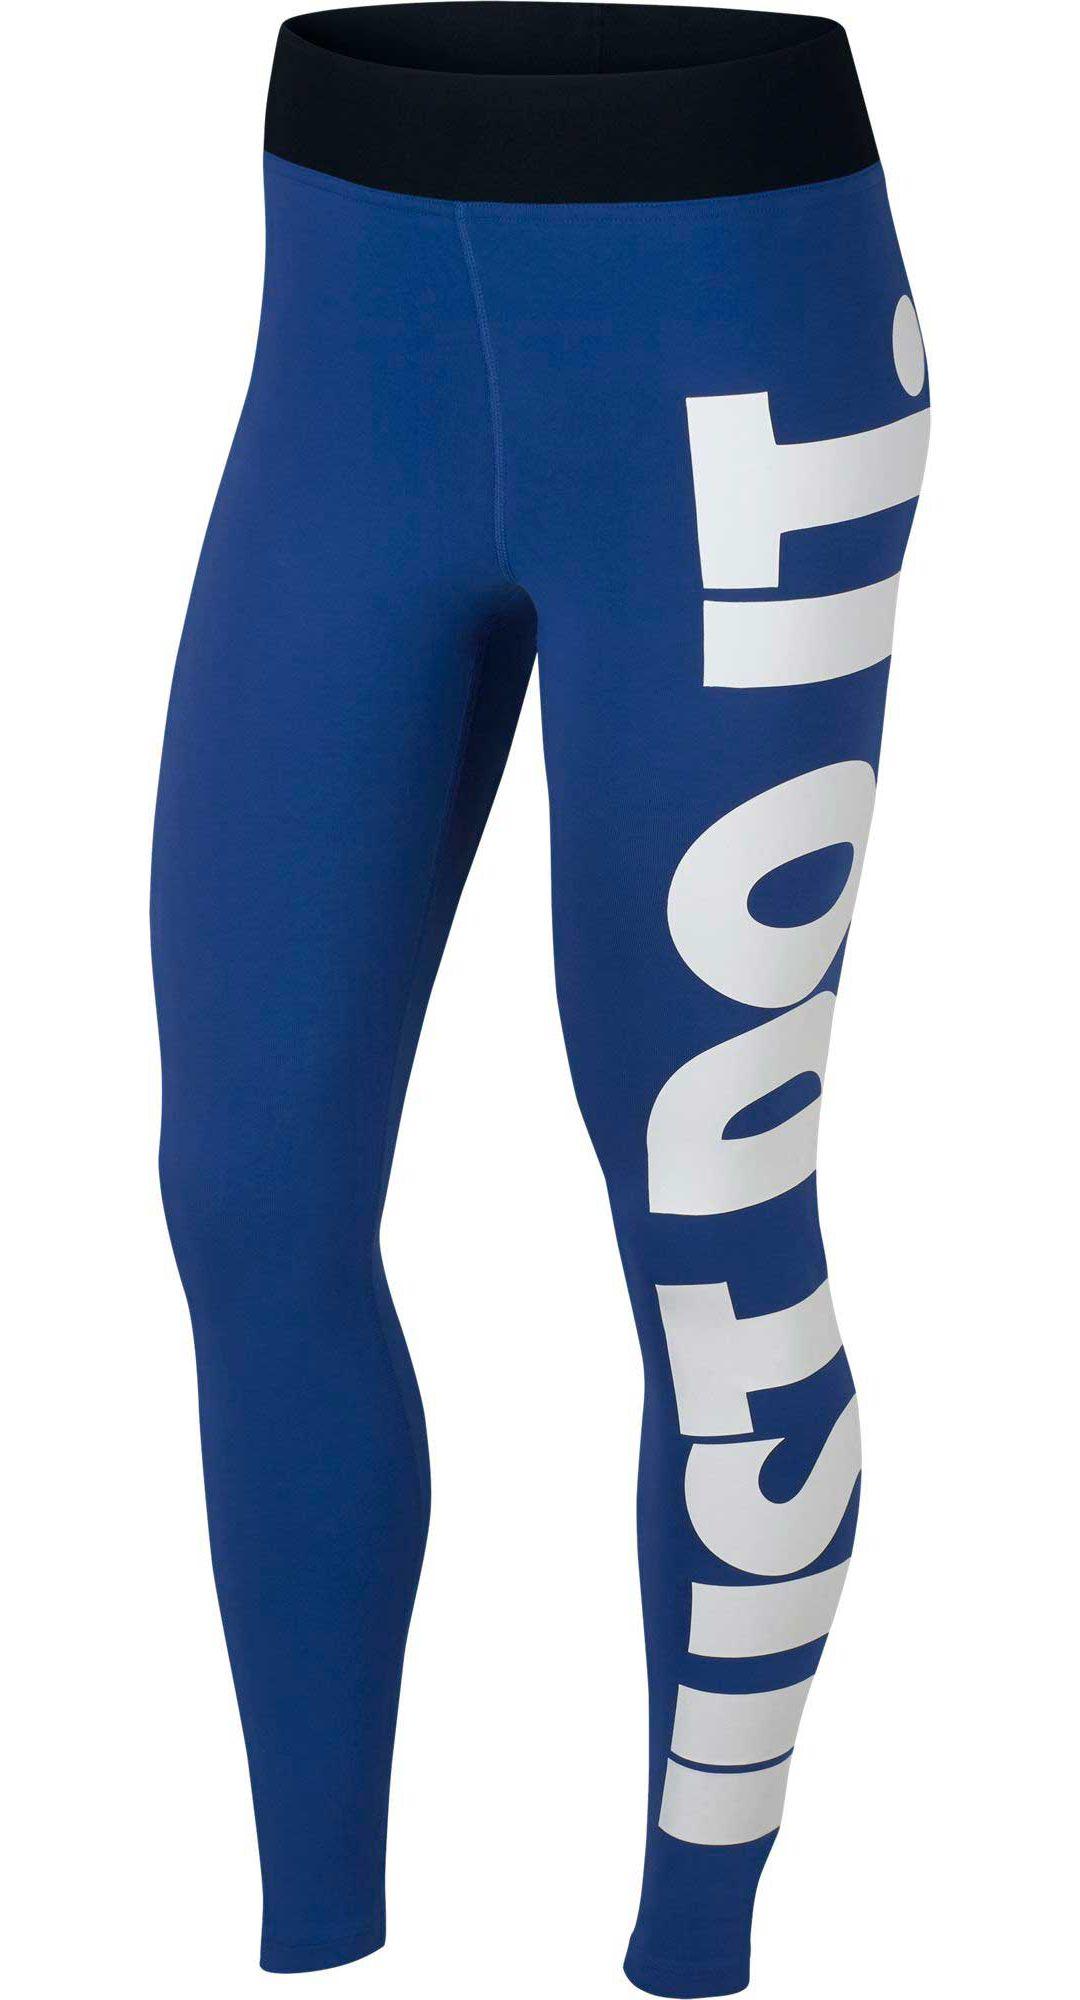 ac1b7875e981e4 Nike Women's Leg-A-See JDI Leggings | DICK'S Sporting Goods